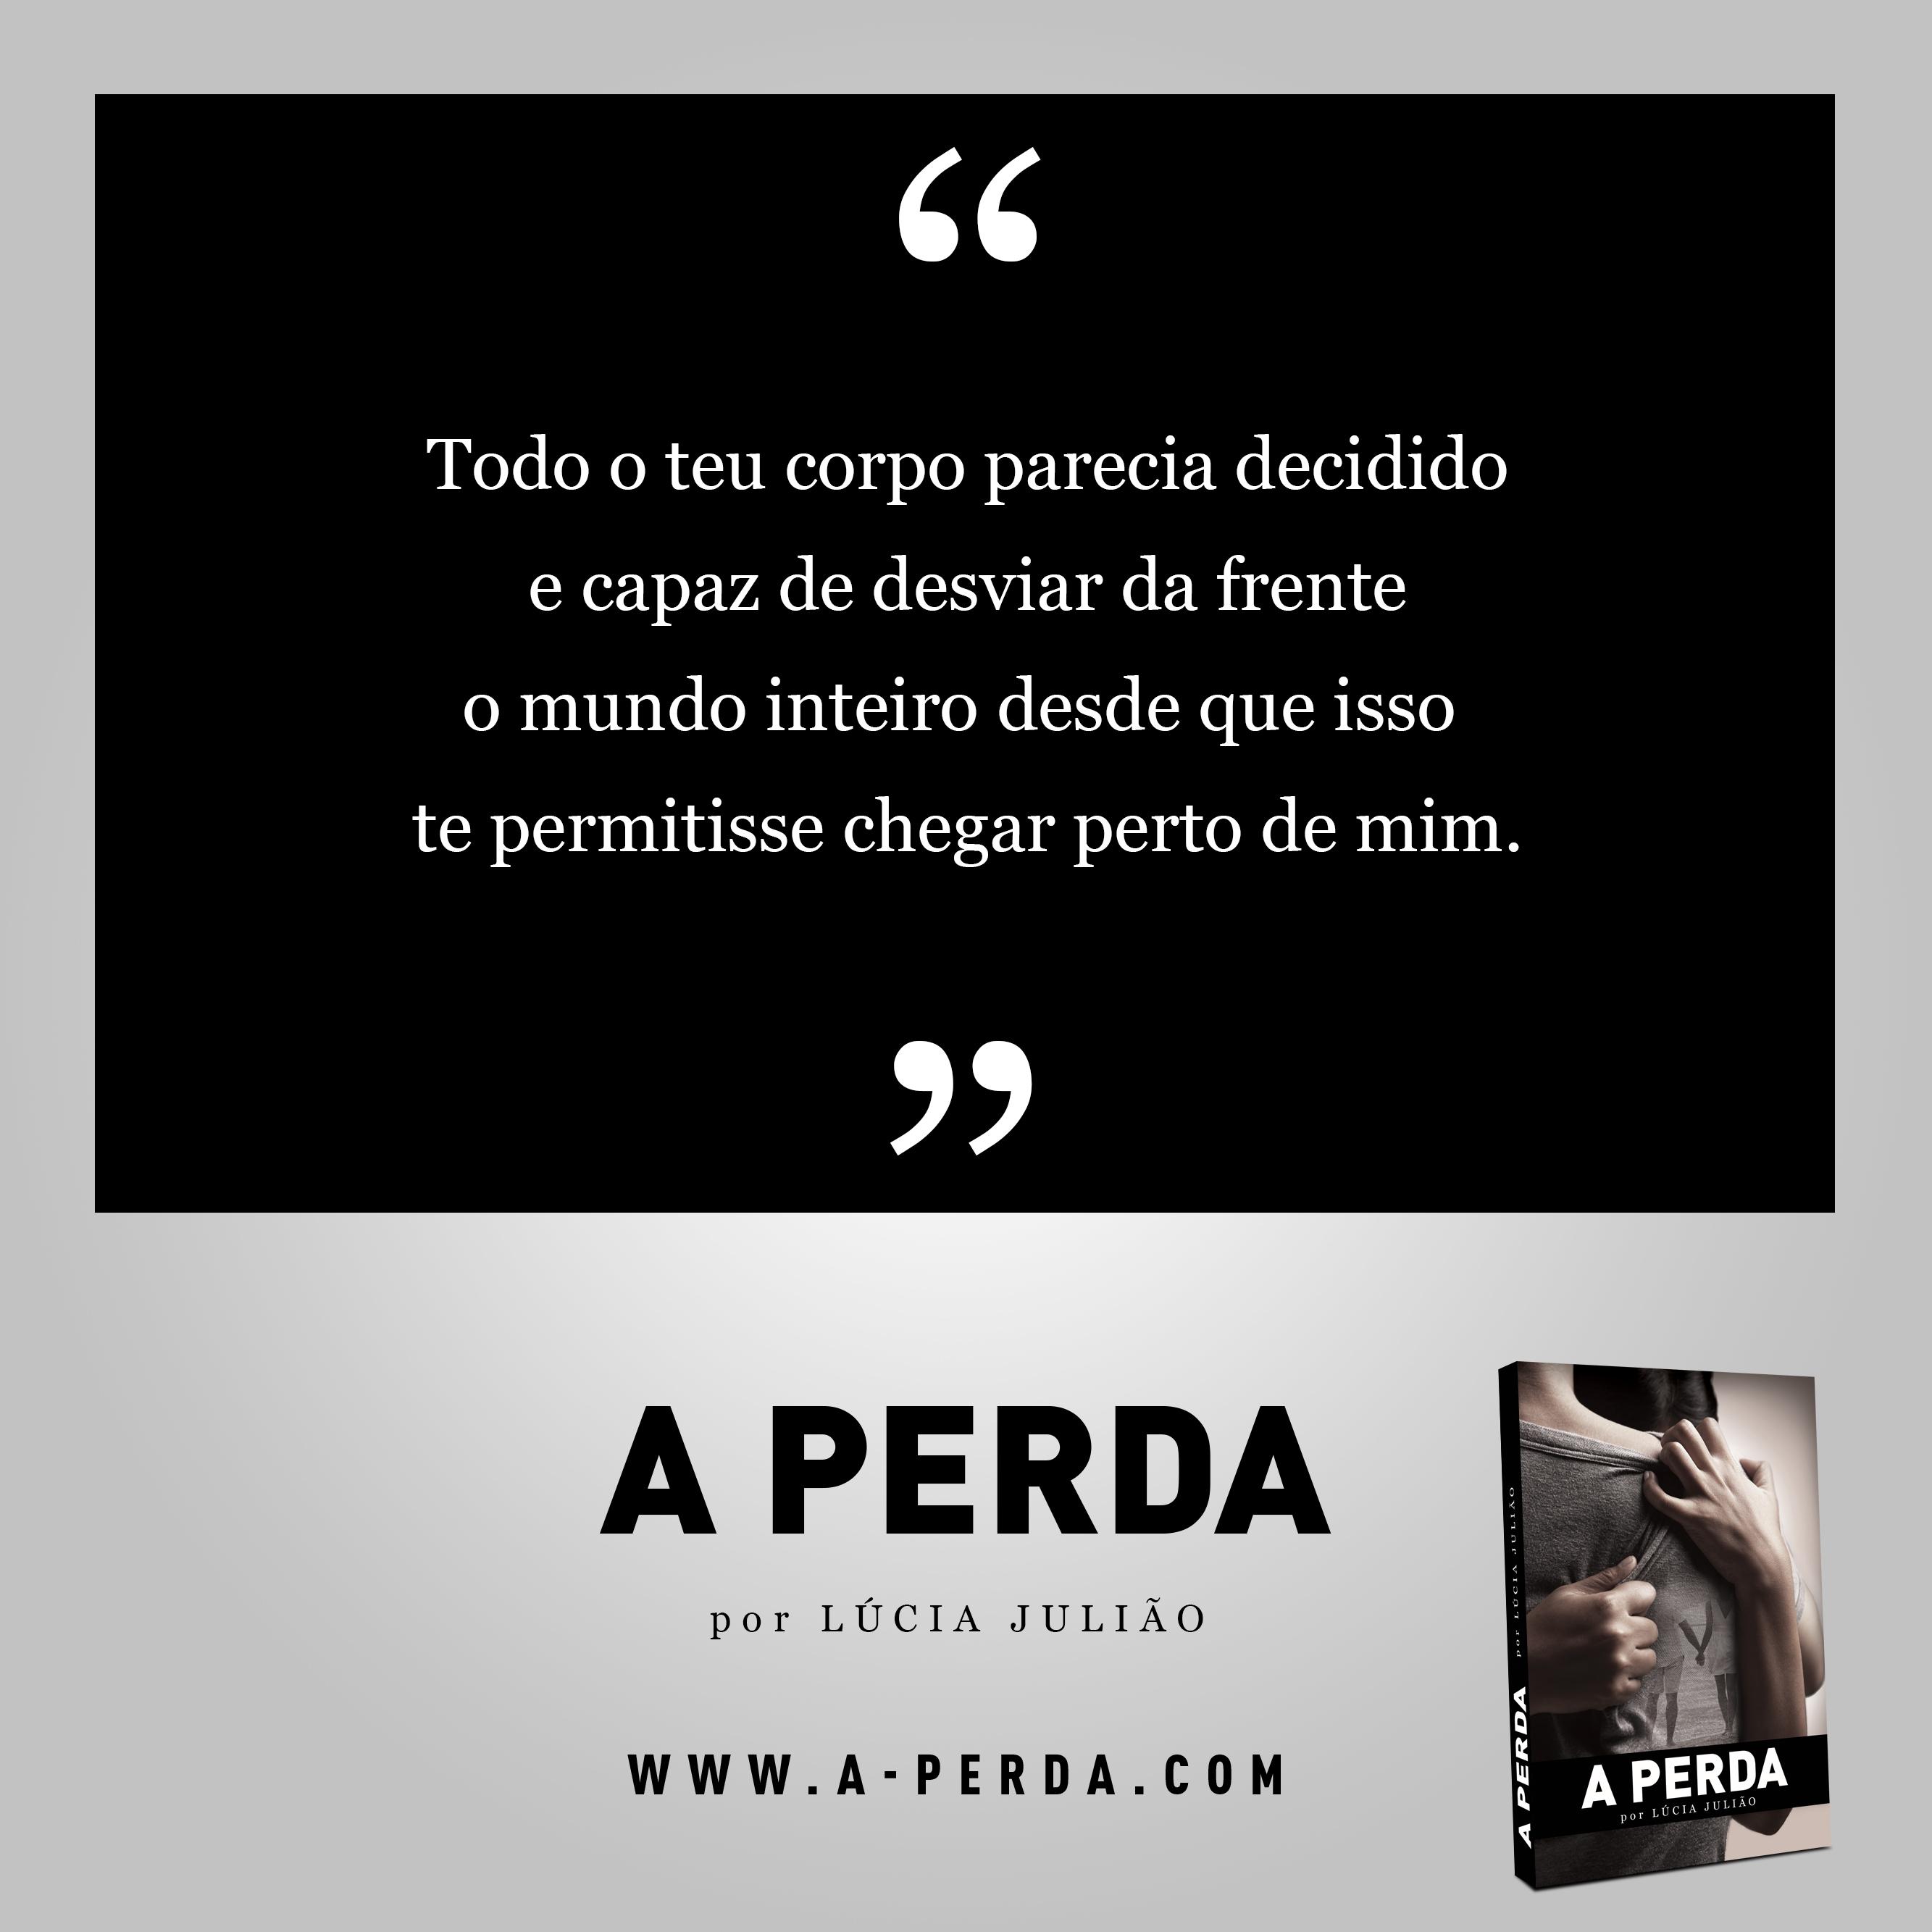 018-capitulo-07-livro-a-Perda-de-Lucia-Juliao-Instagram